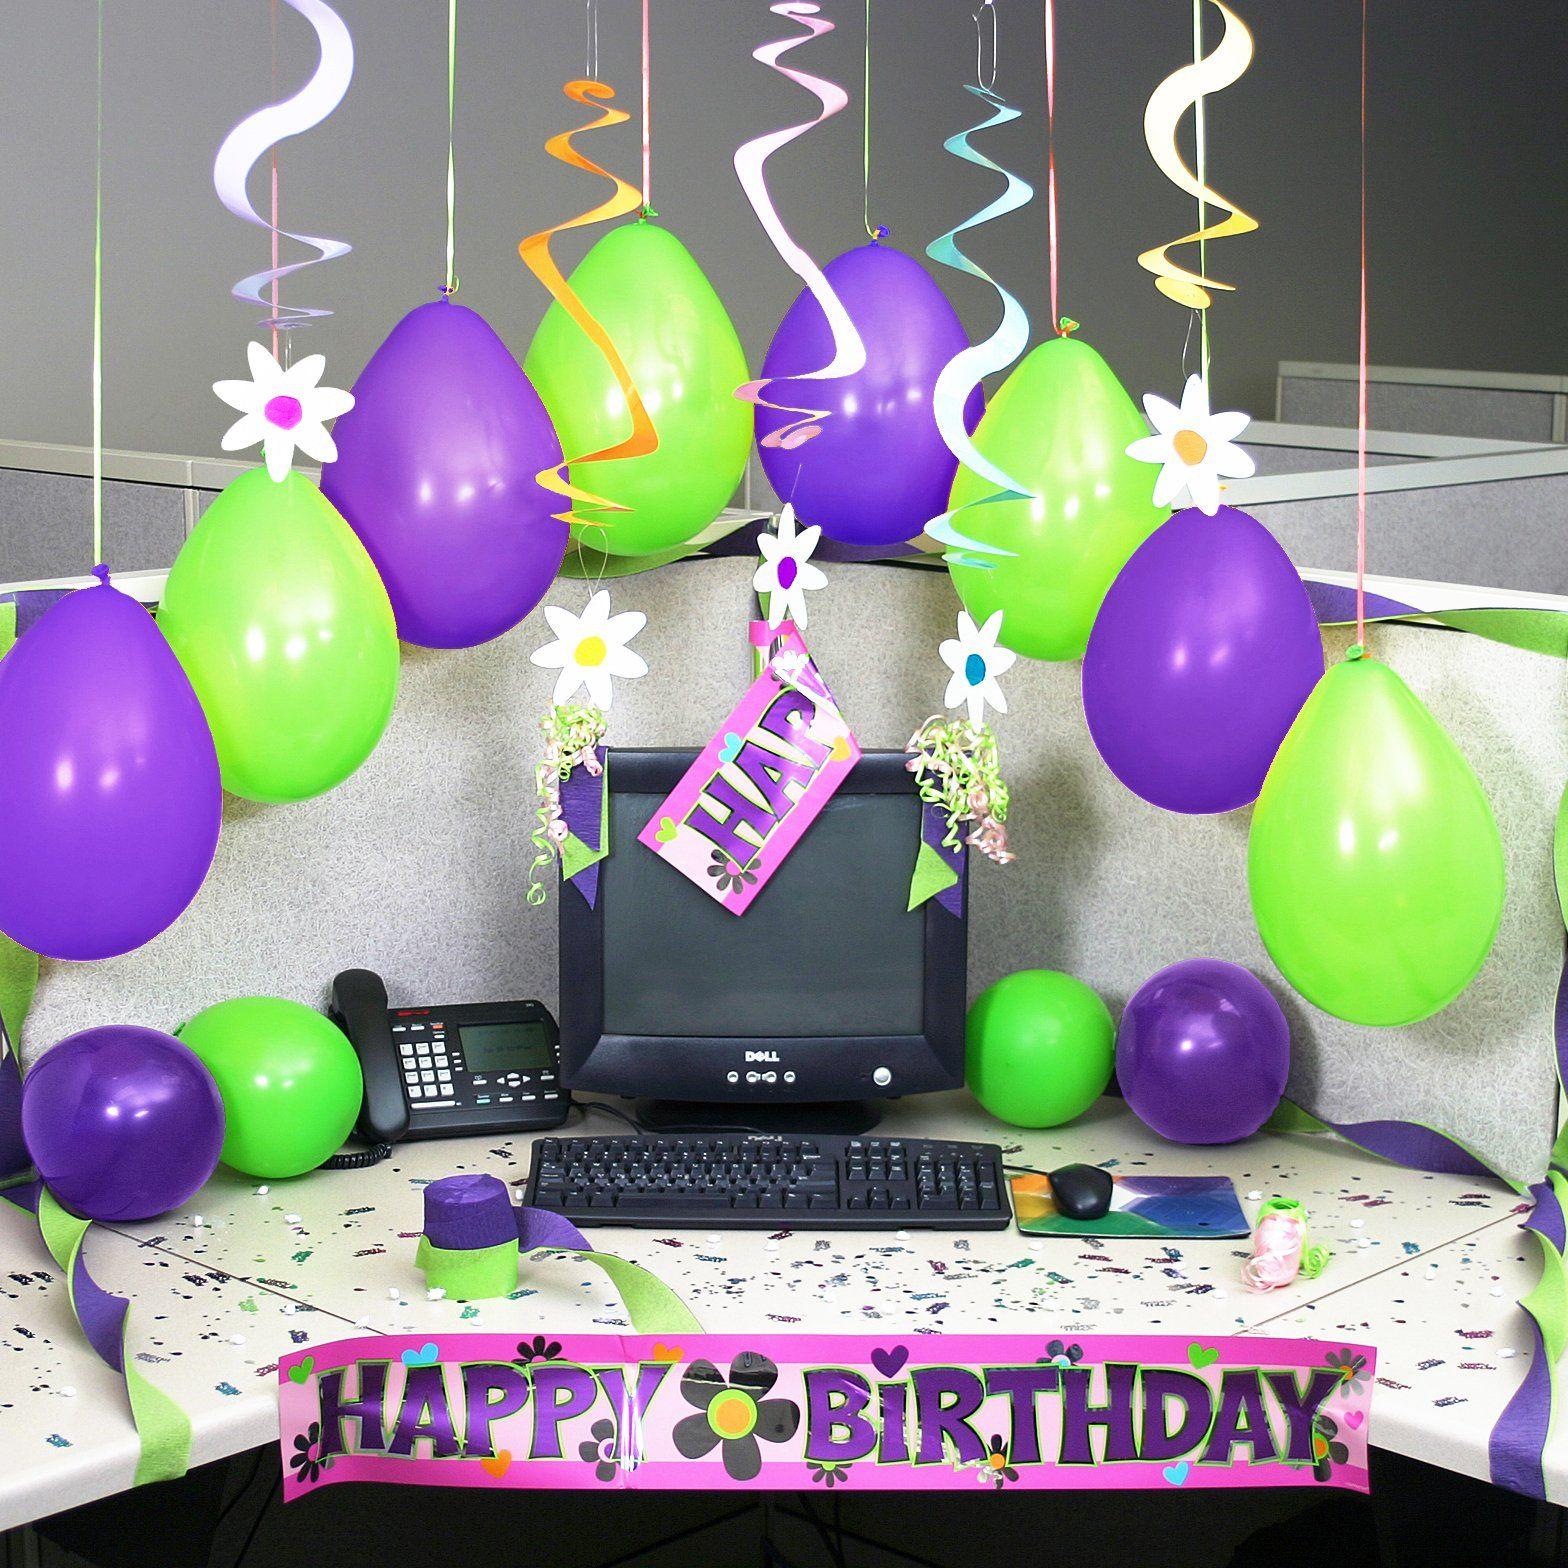 Office Bday Deco Idea Office Birthday Decorations Office Birthday Cubicle Birthday Decorations